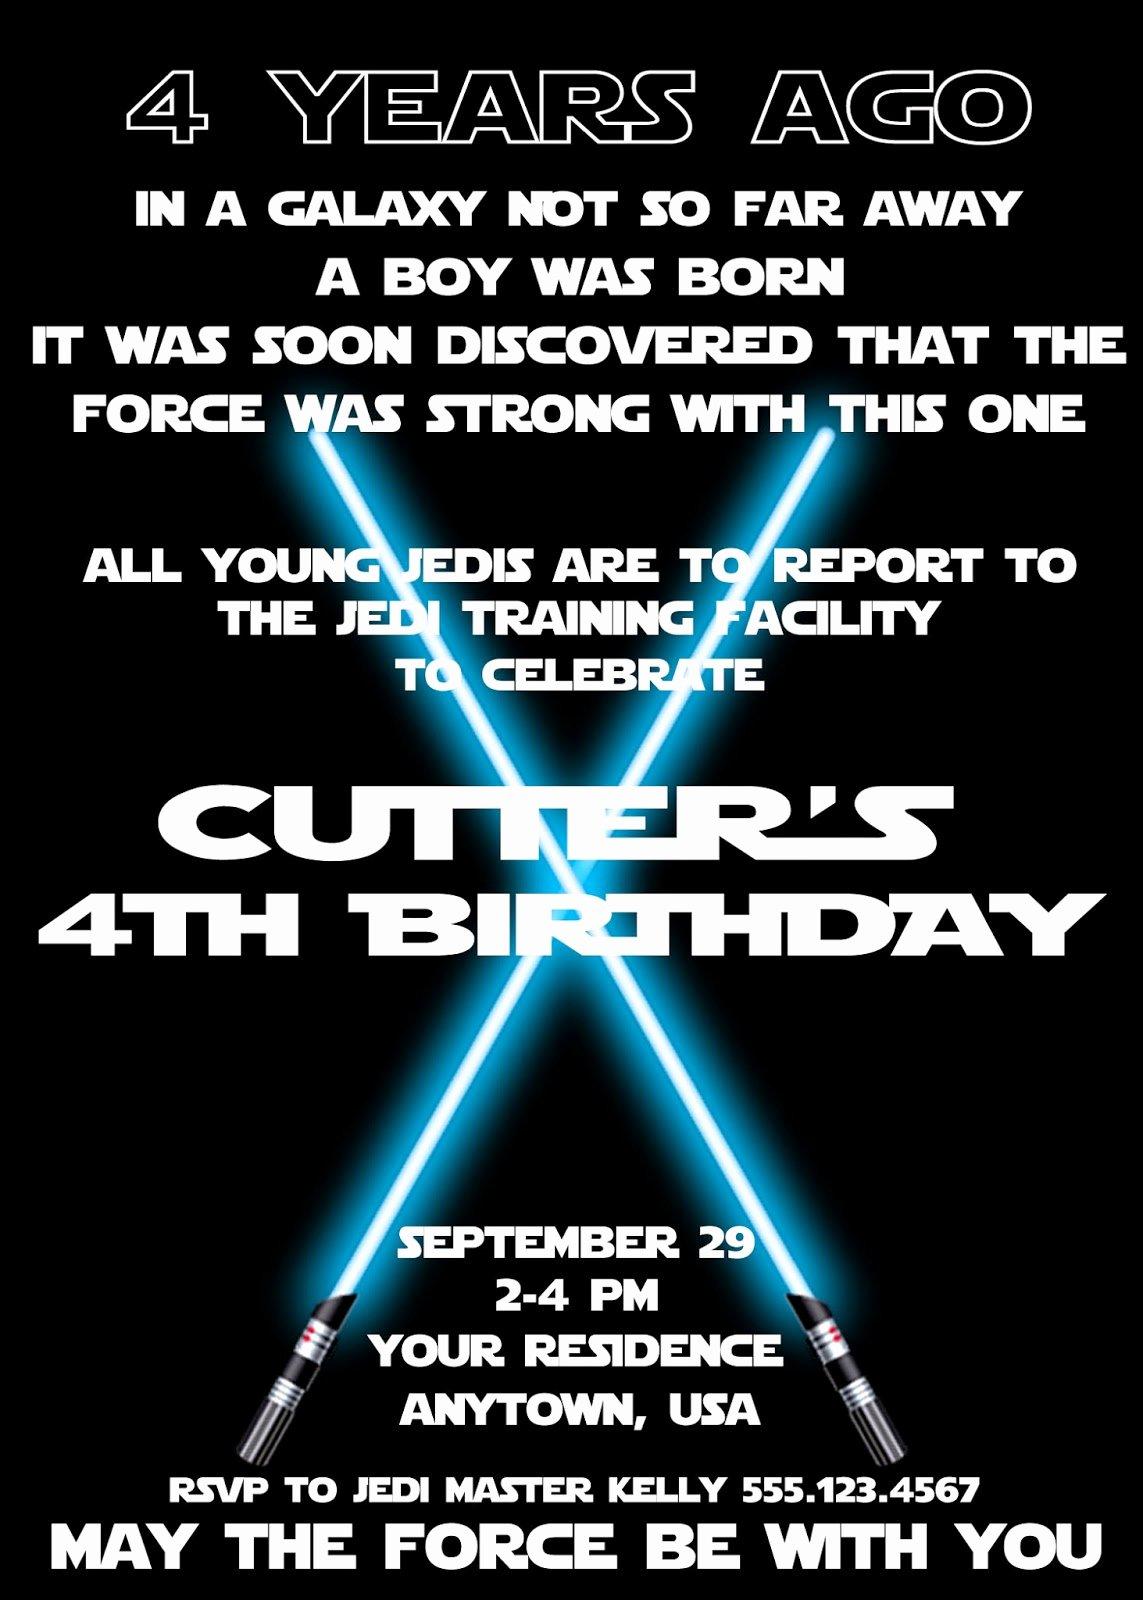 Star Wars Birthday Invites Elegant Plan An Amazing Star Wars Birthday Party